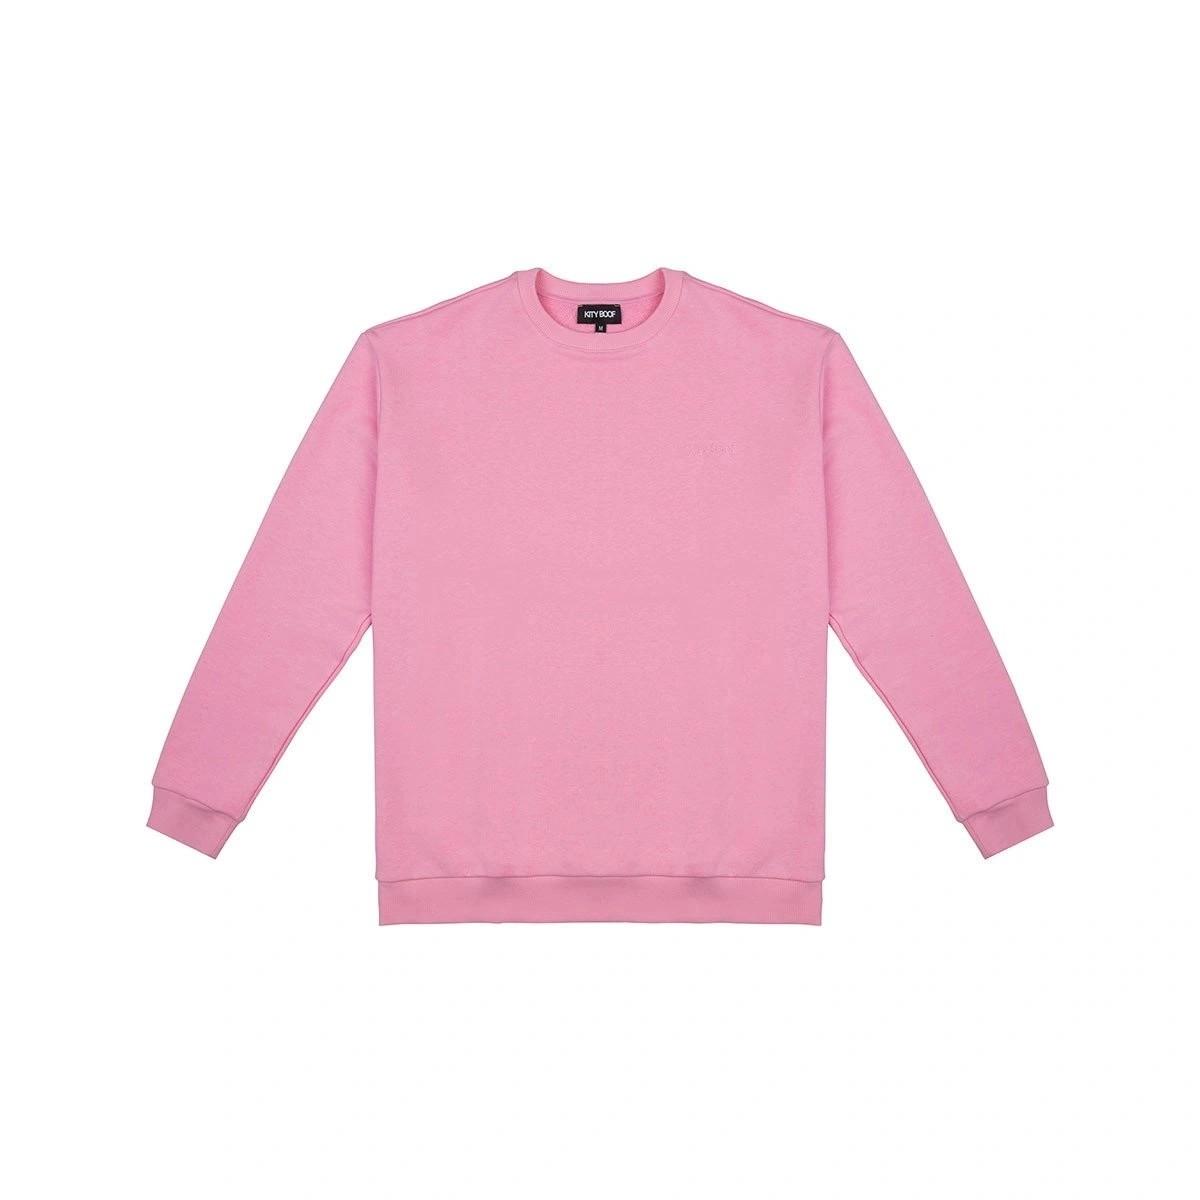 Kity Boof Sweatshirt Pink